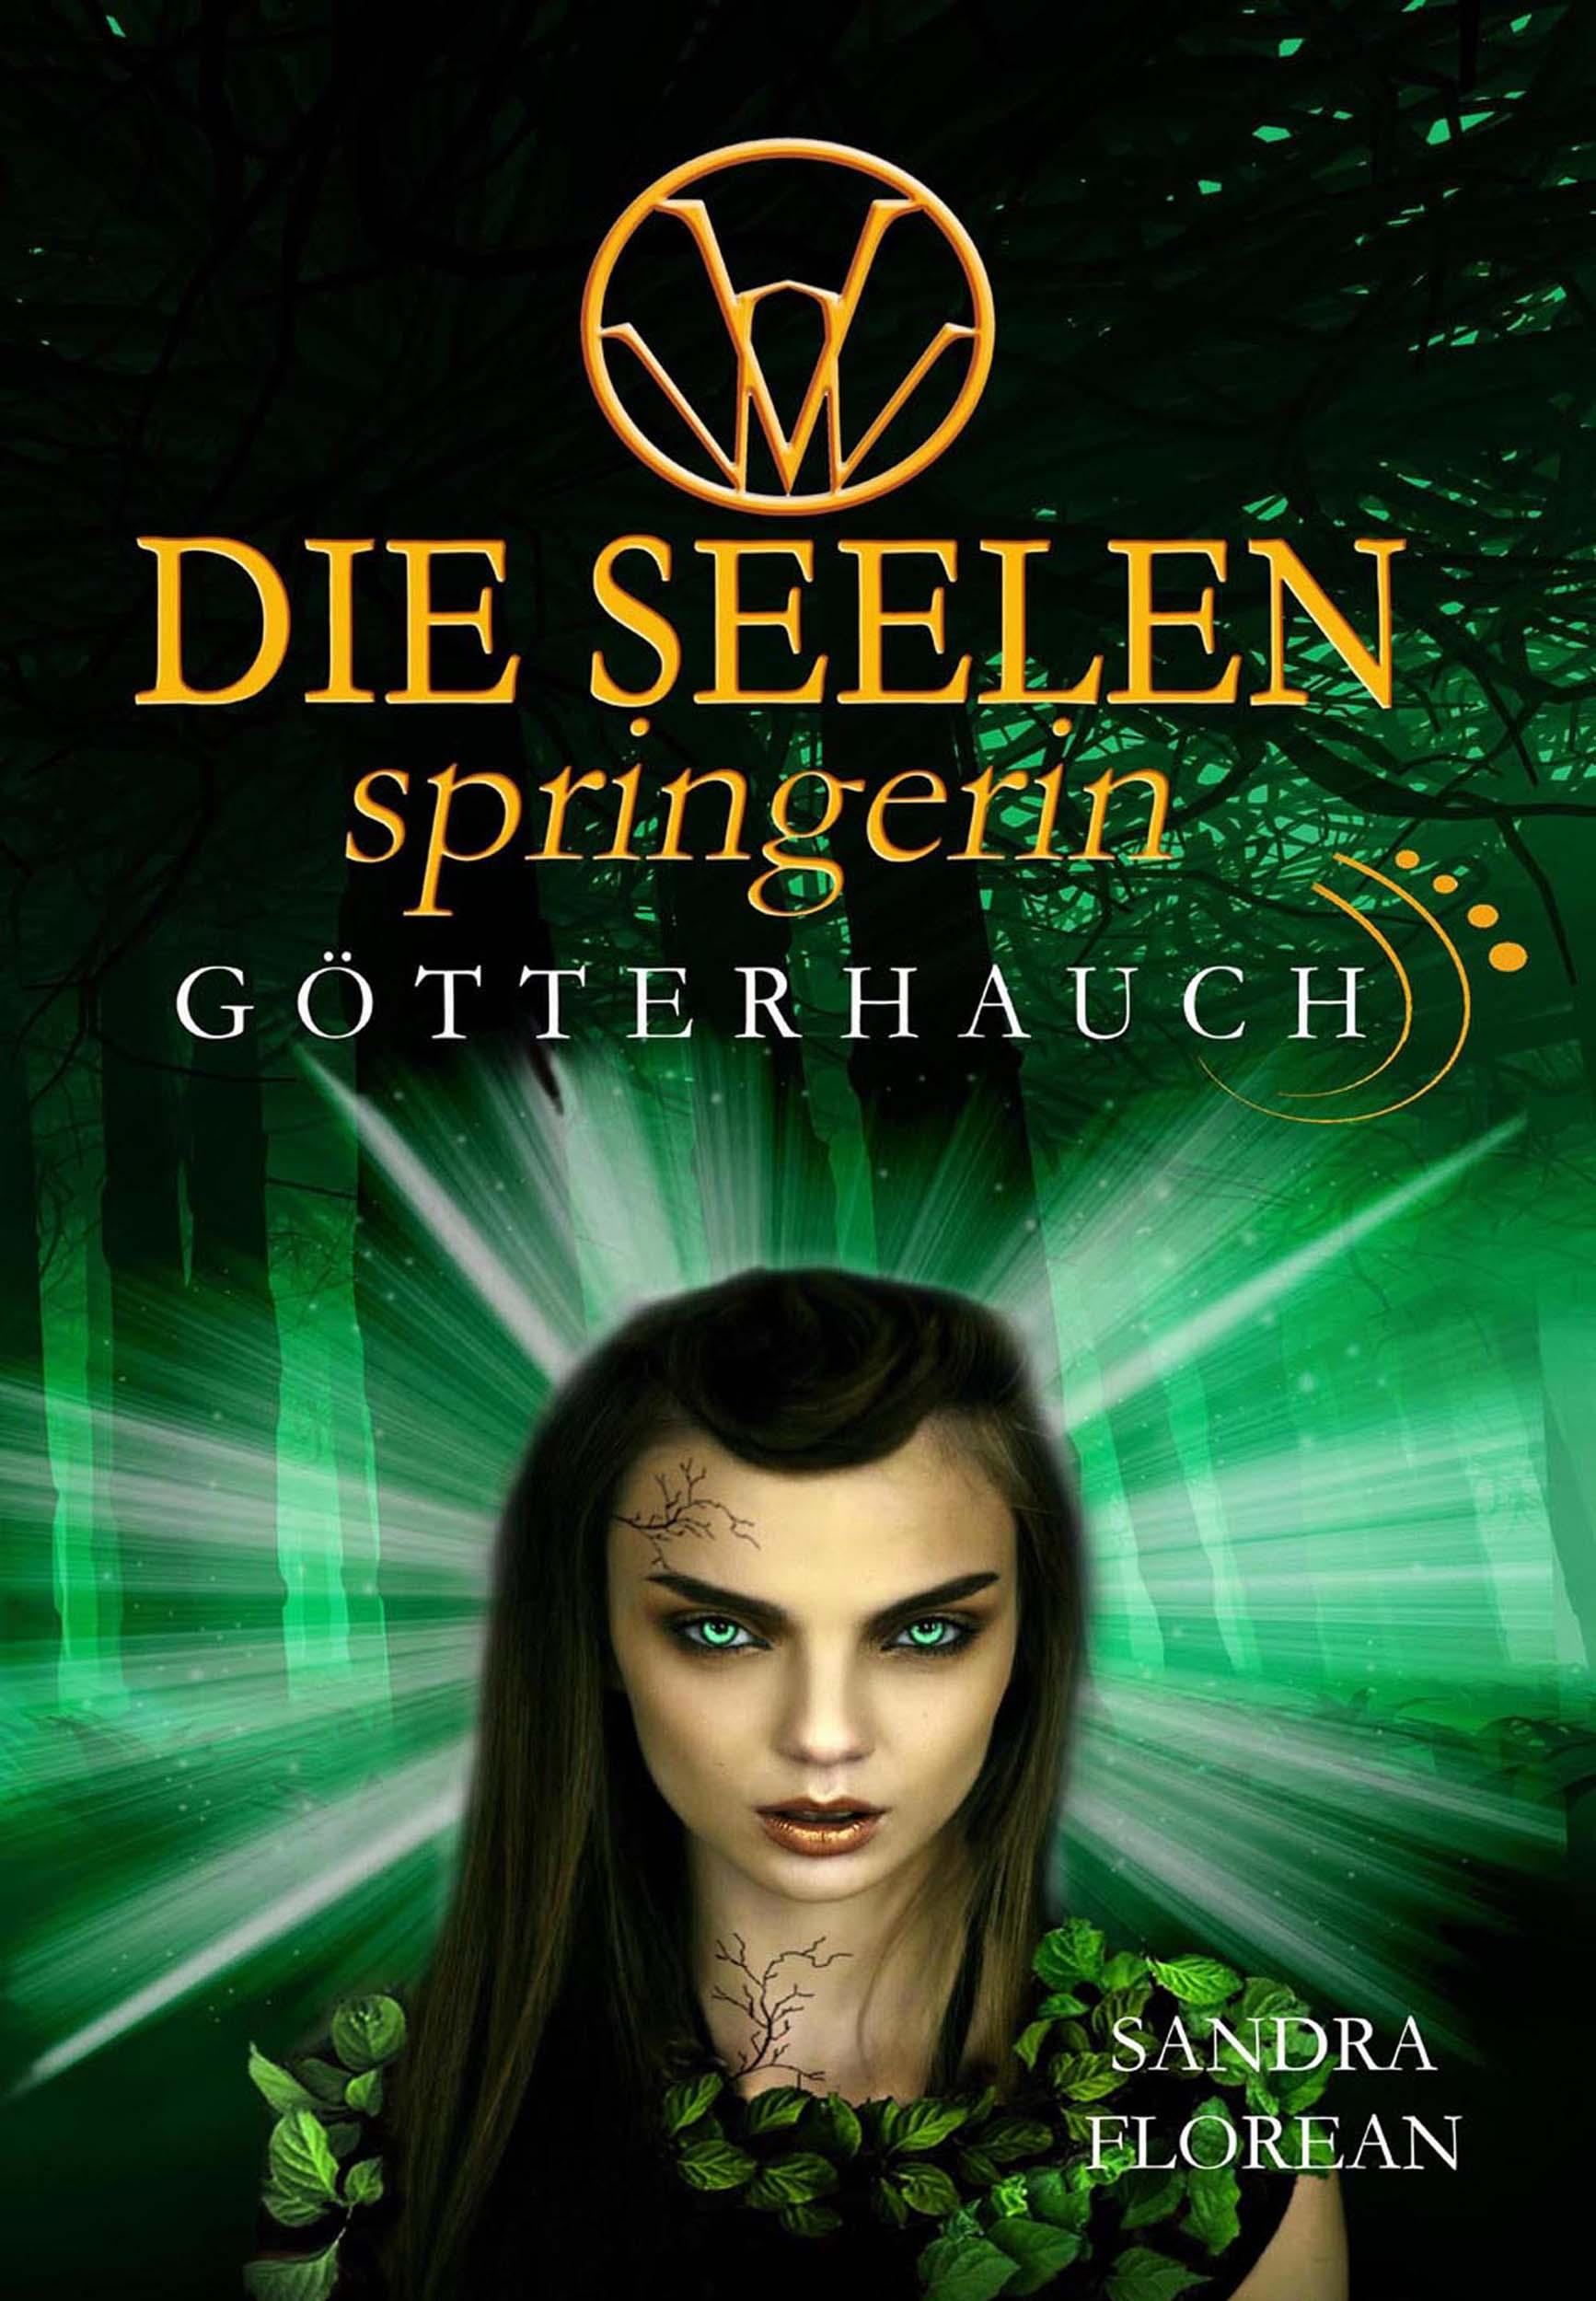 sandra_florean_die-seelenspringerin_goetterhauch_phantastik-autoren-netzwerk.jpg